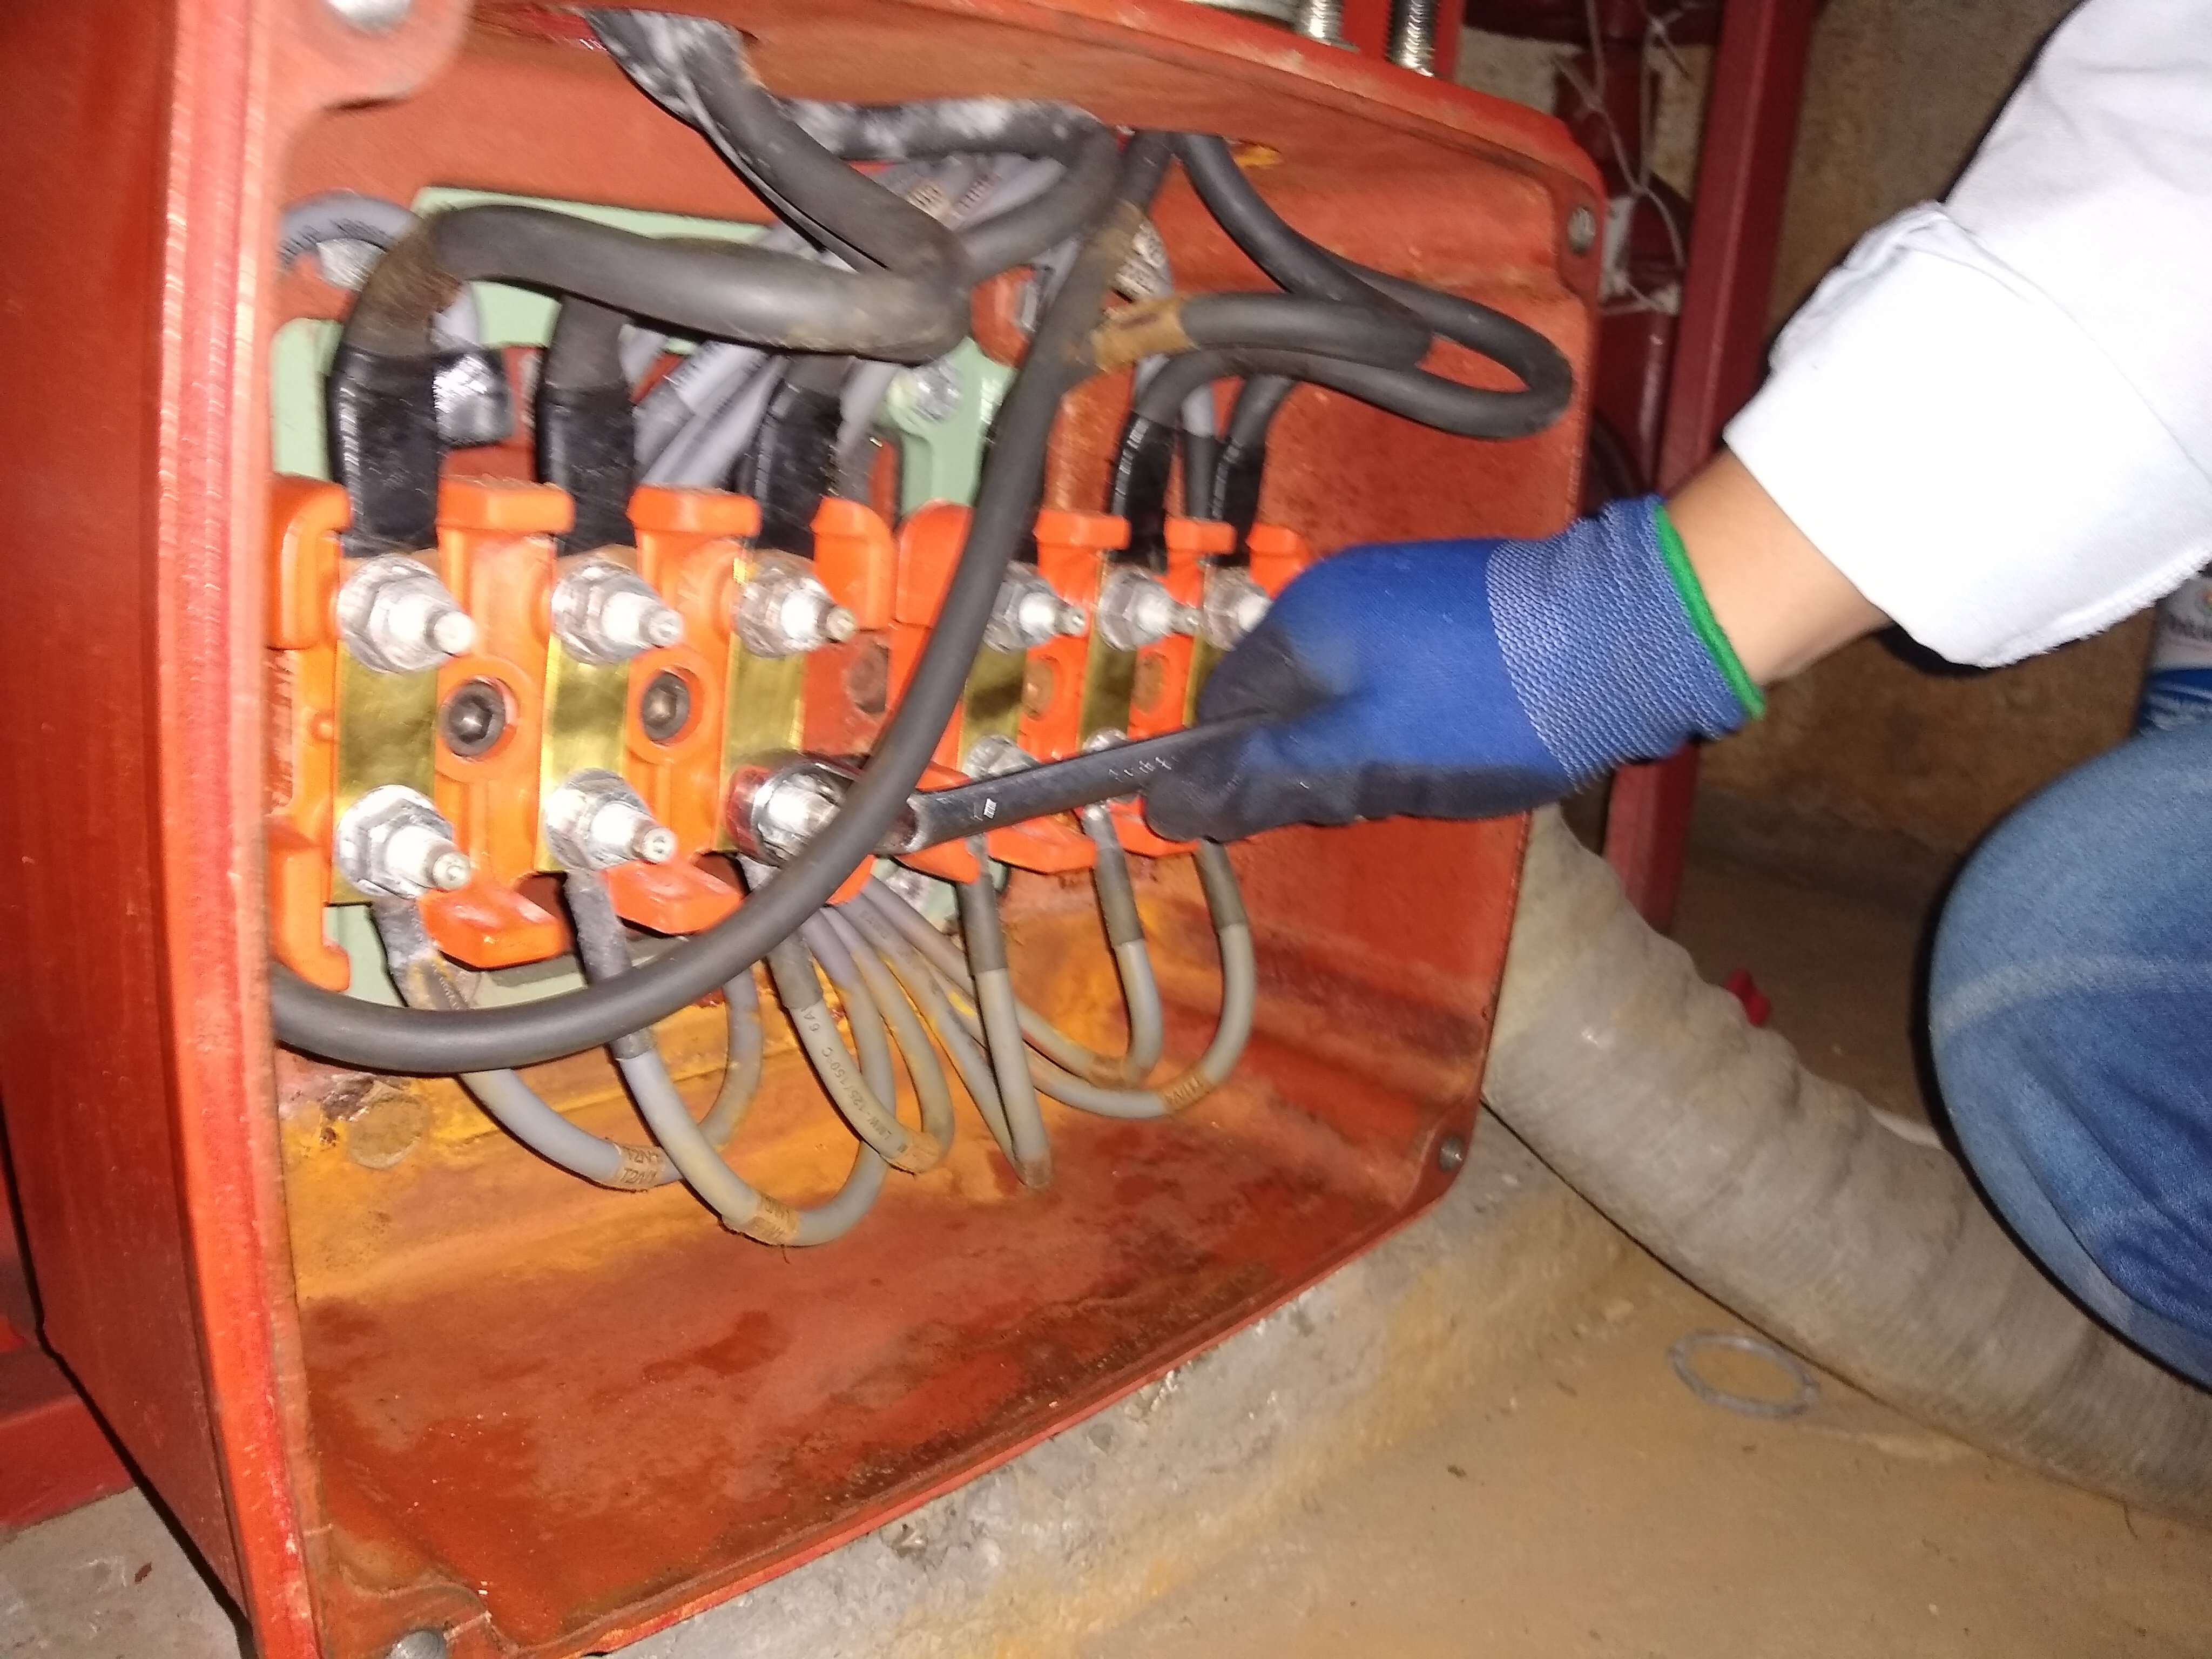 Verificación de conexionado eléctrico a motor